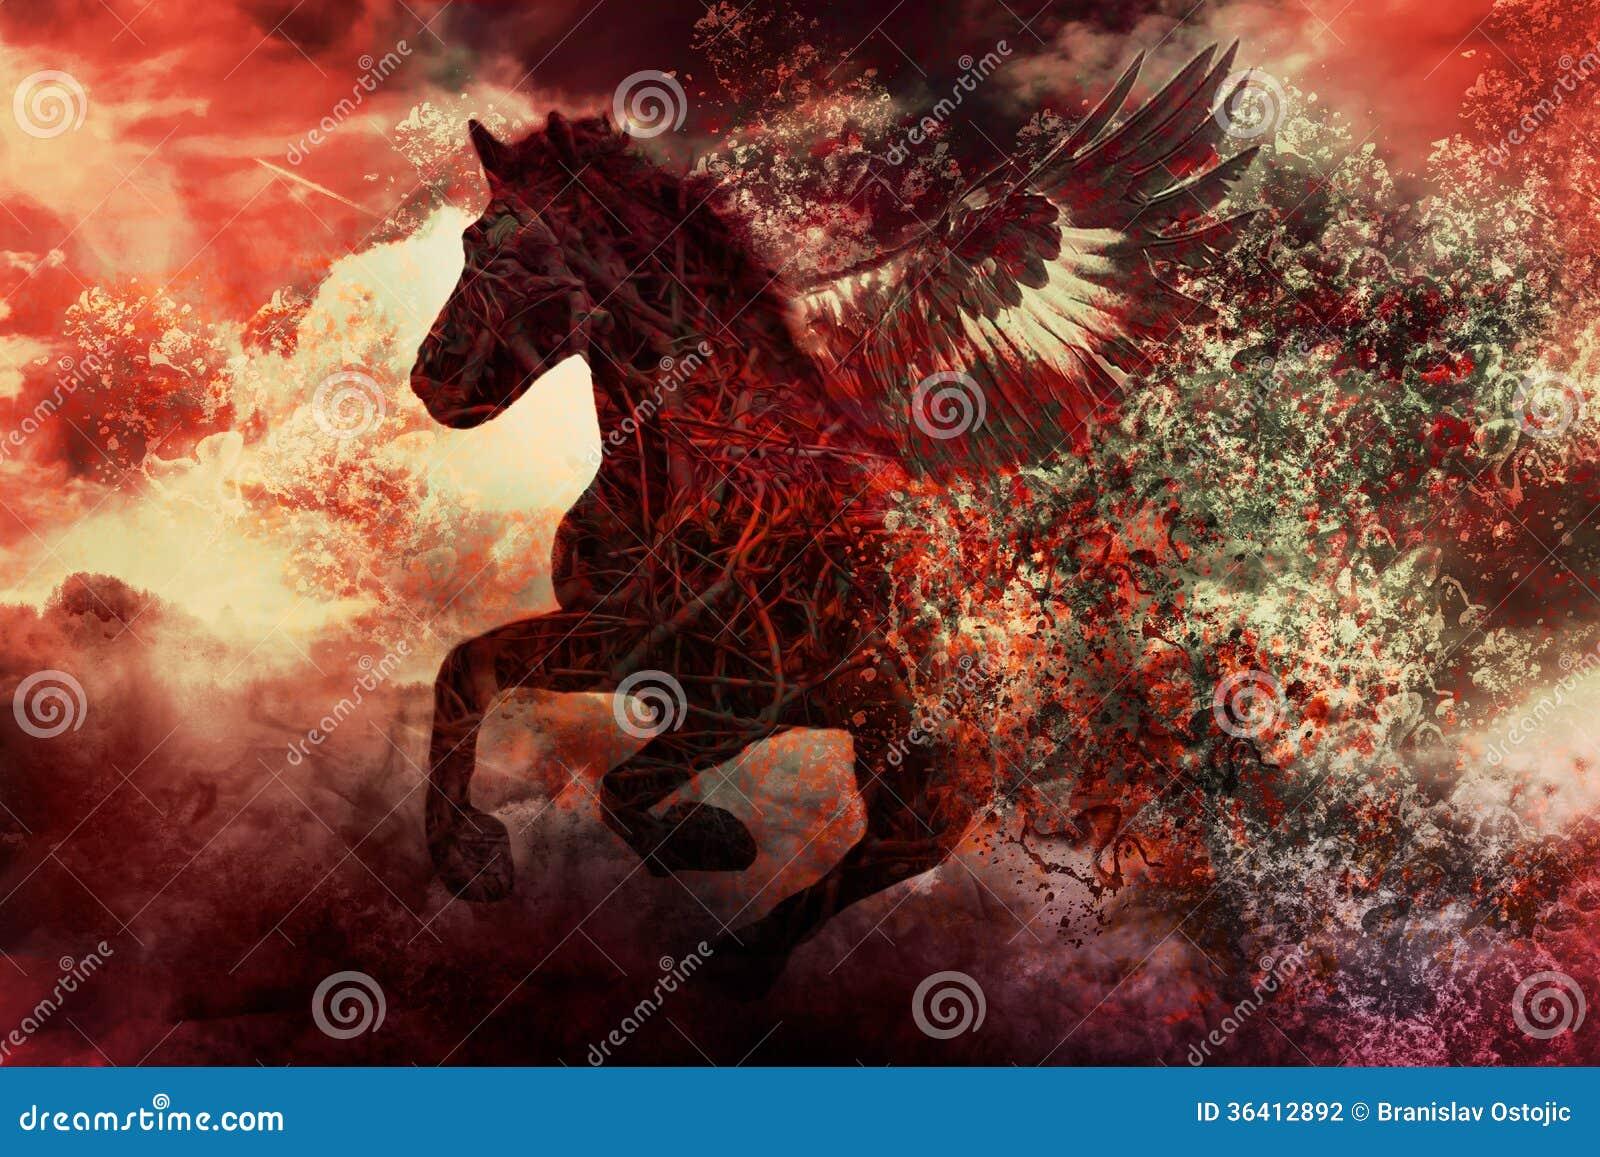 Cavalo escuro da fantasia